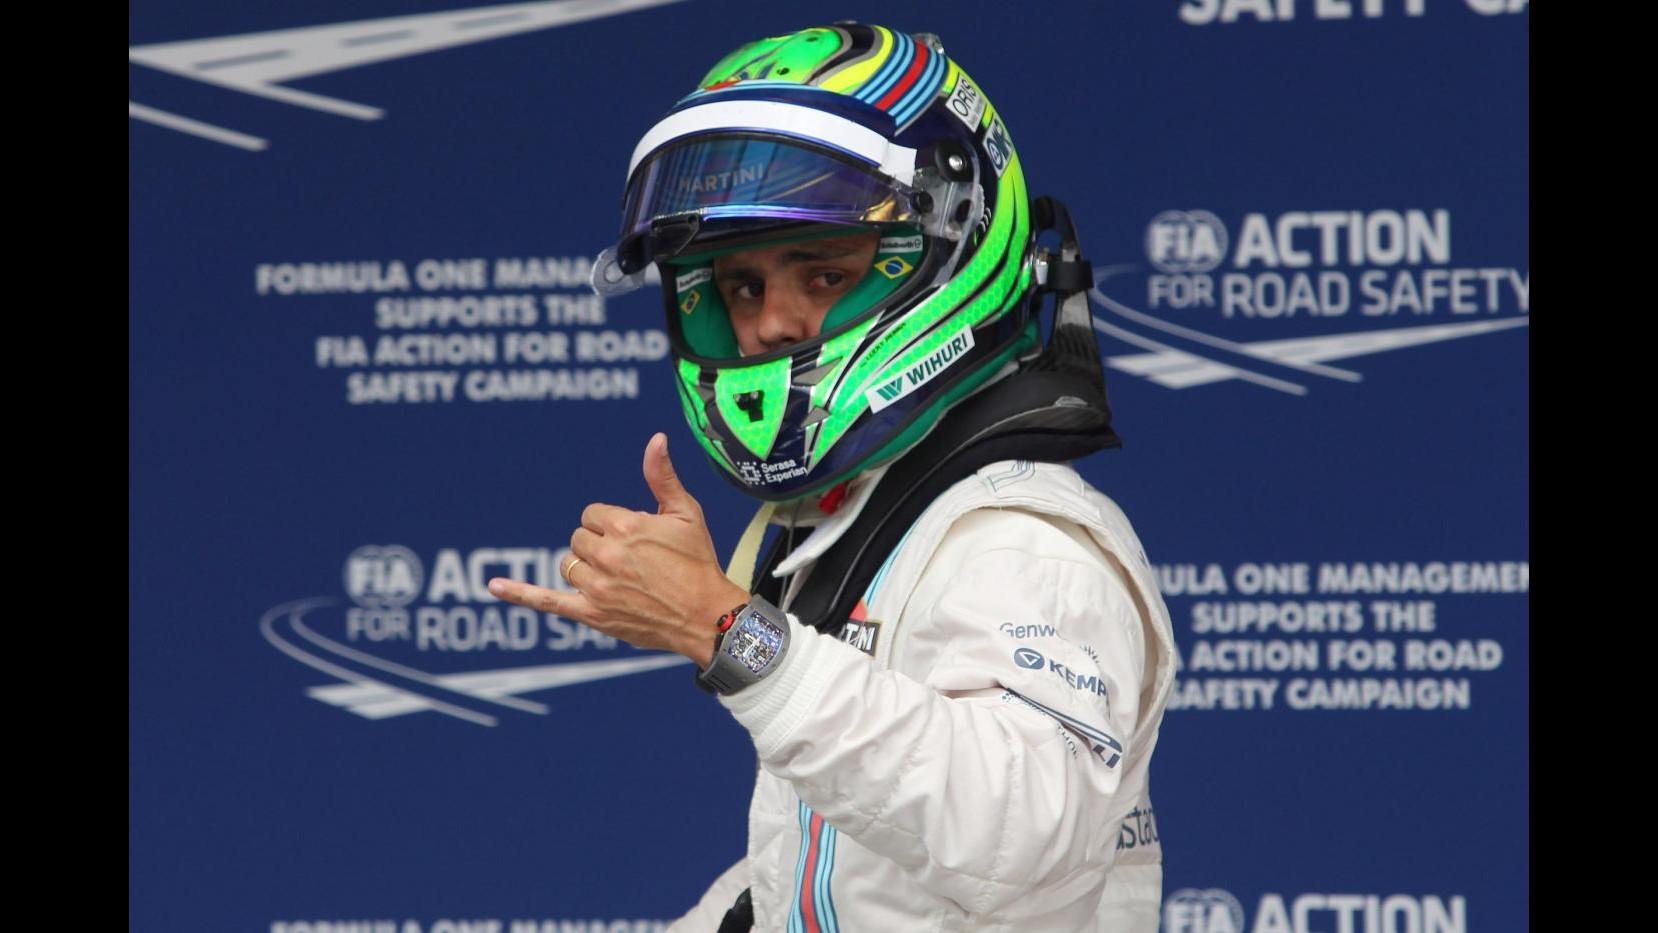 F1, Massa: Macchina competitiva, spero in bel risultato in gara